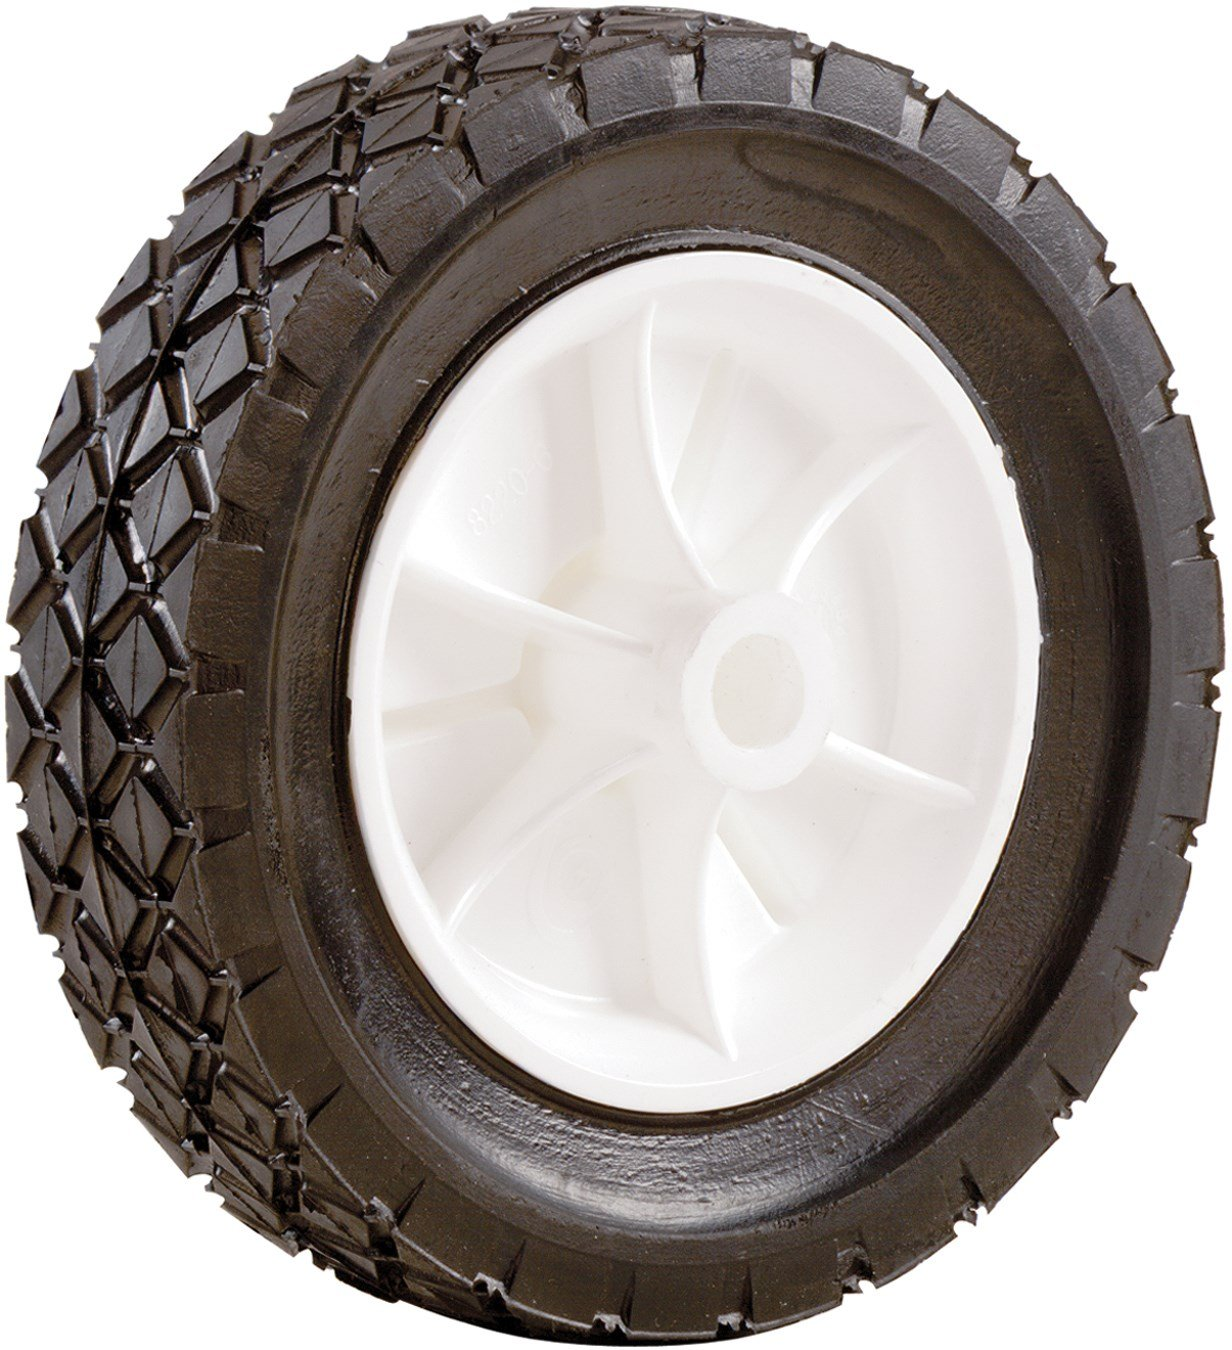 Shepherd Hardware 9613 8-Inch Semi-Pneumatic Rubber Replacement Tire, Plastic Wheel, 1-3/4-Inch Diamond Tread, 1/2-Inch Bore Offset Axle